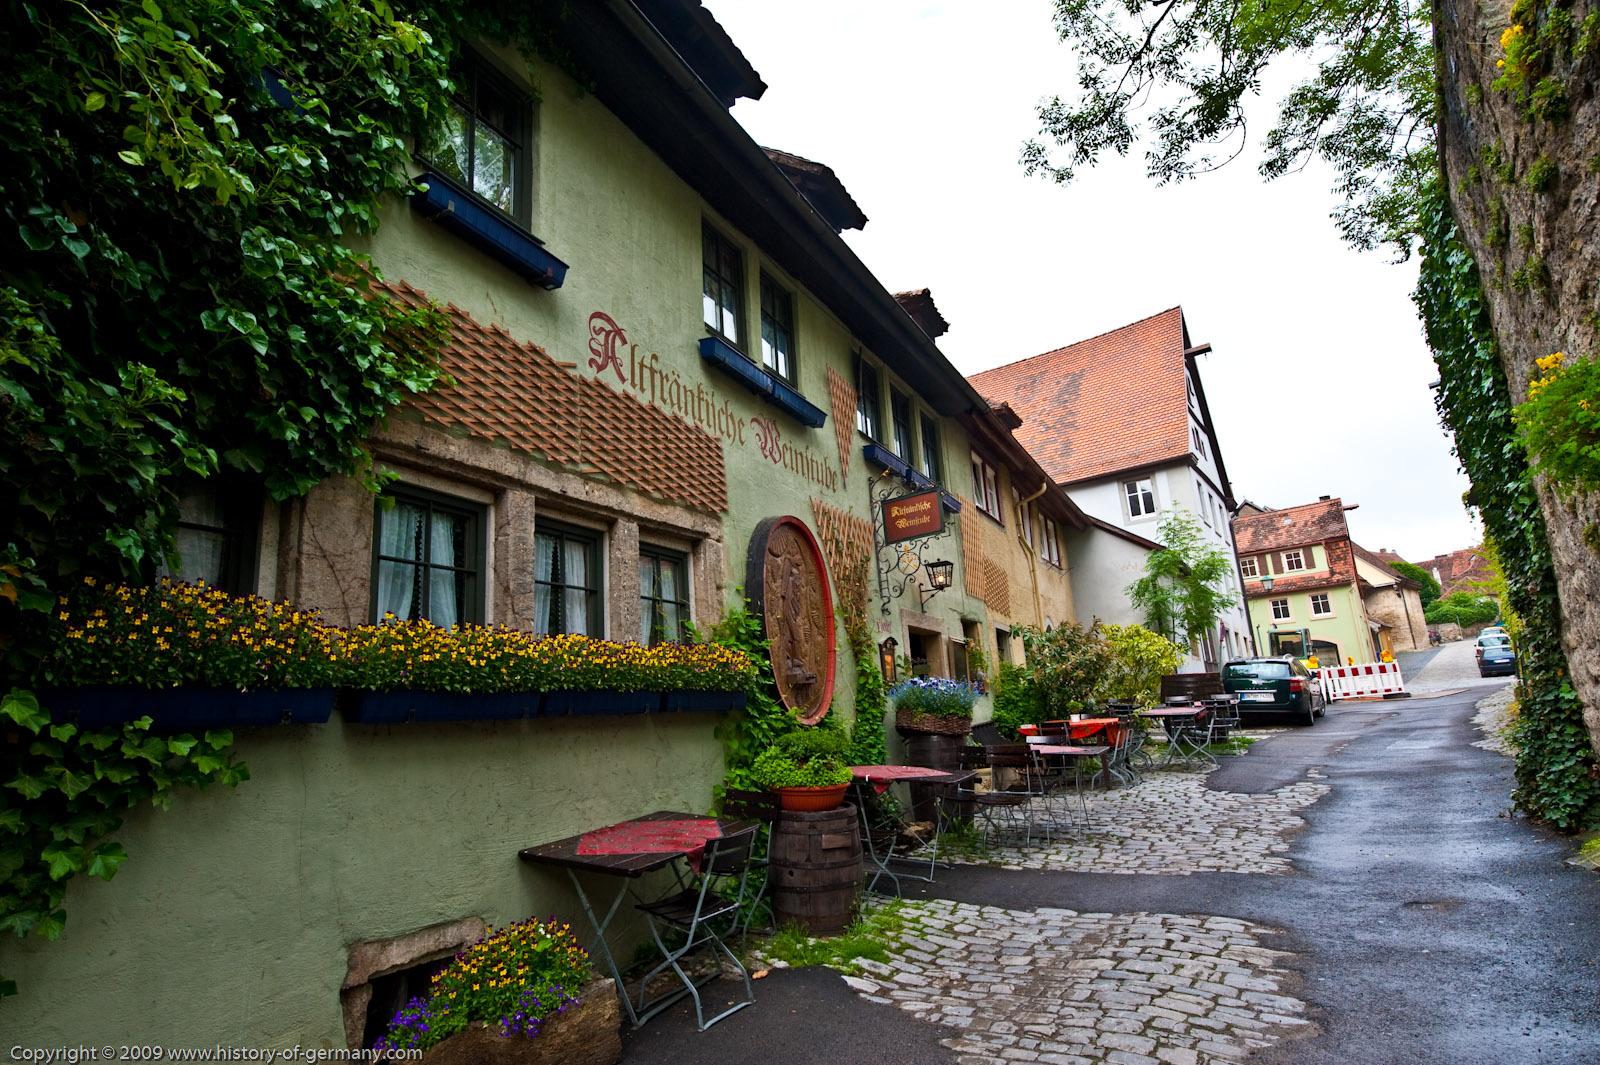 rothenburg_ob_der_tauber-78.jpg